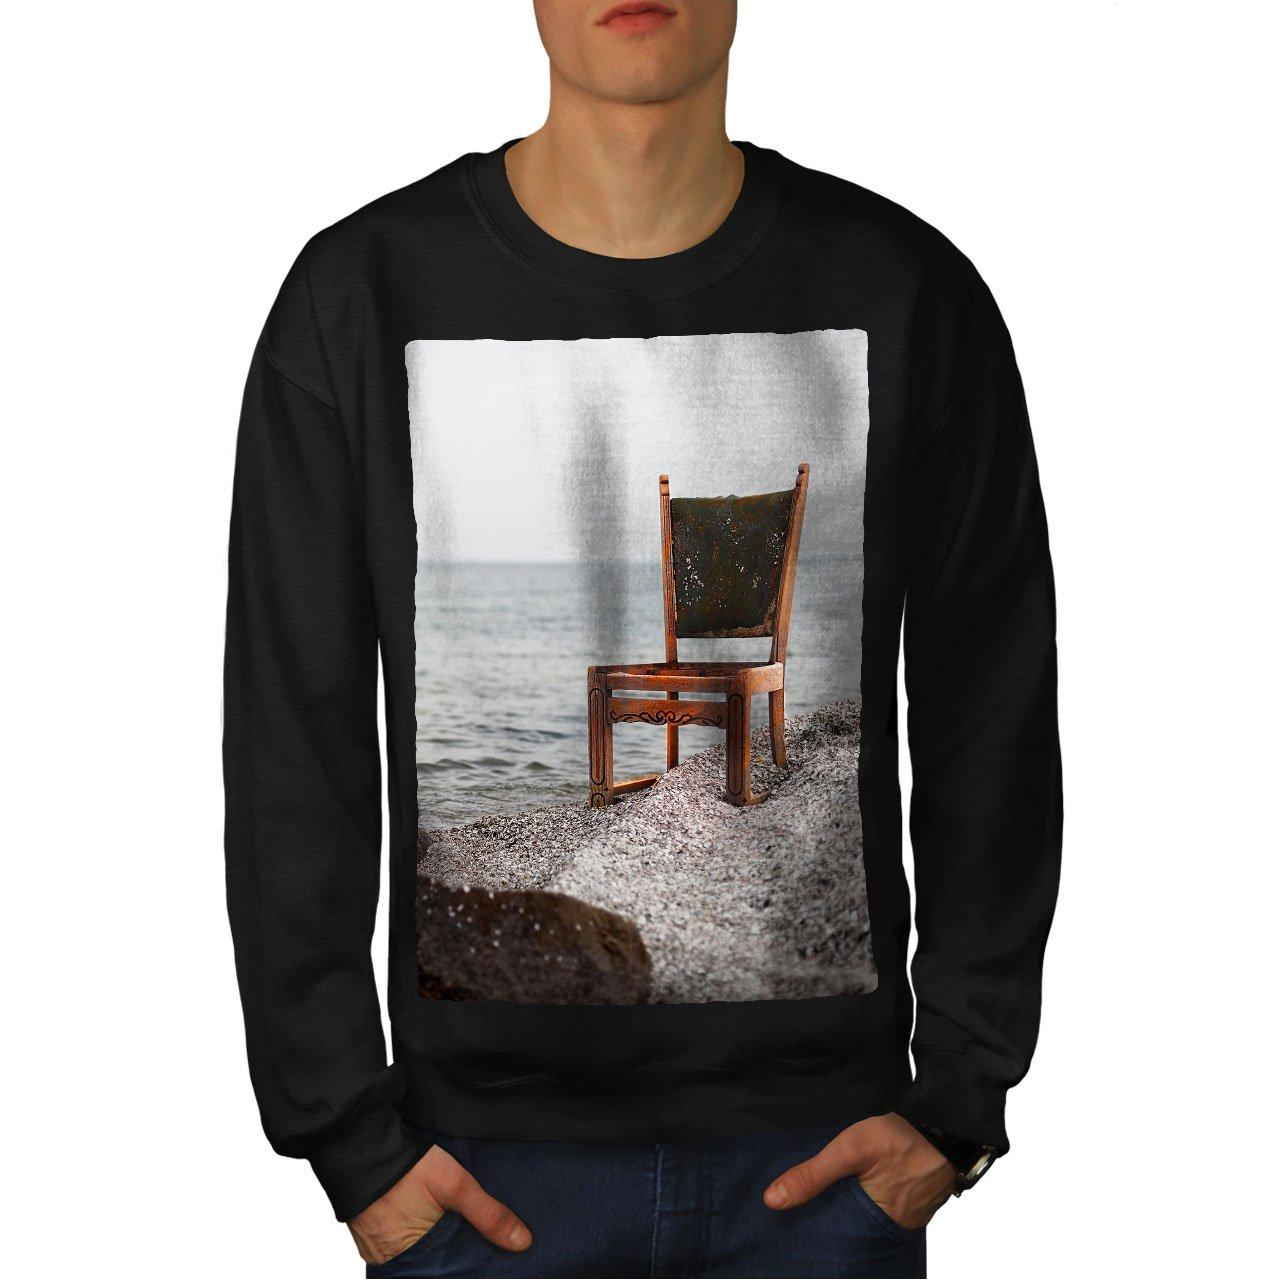 wellcoda Ocean Art Photo Nature Mens Sweatshirt Ocean Casual Jumper